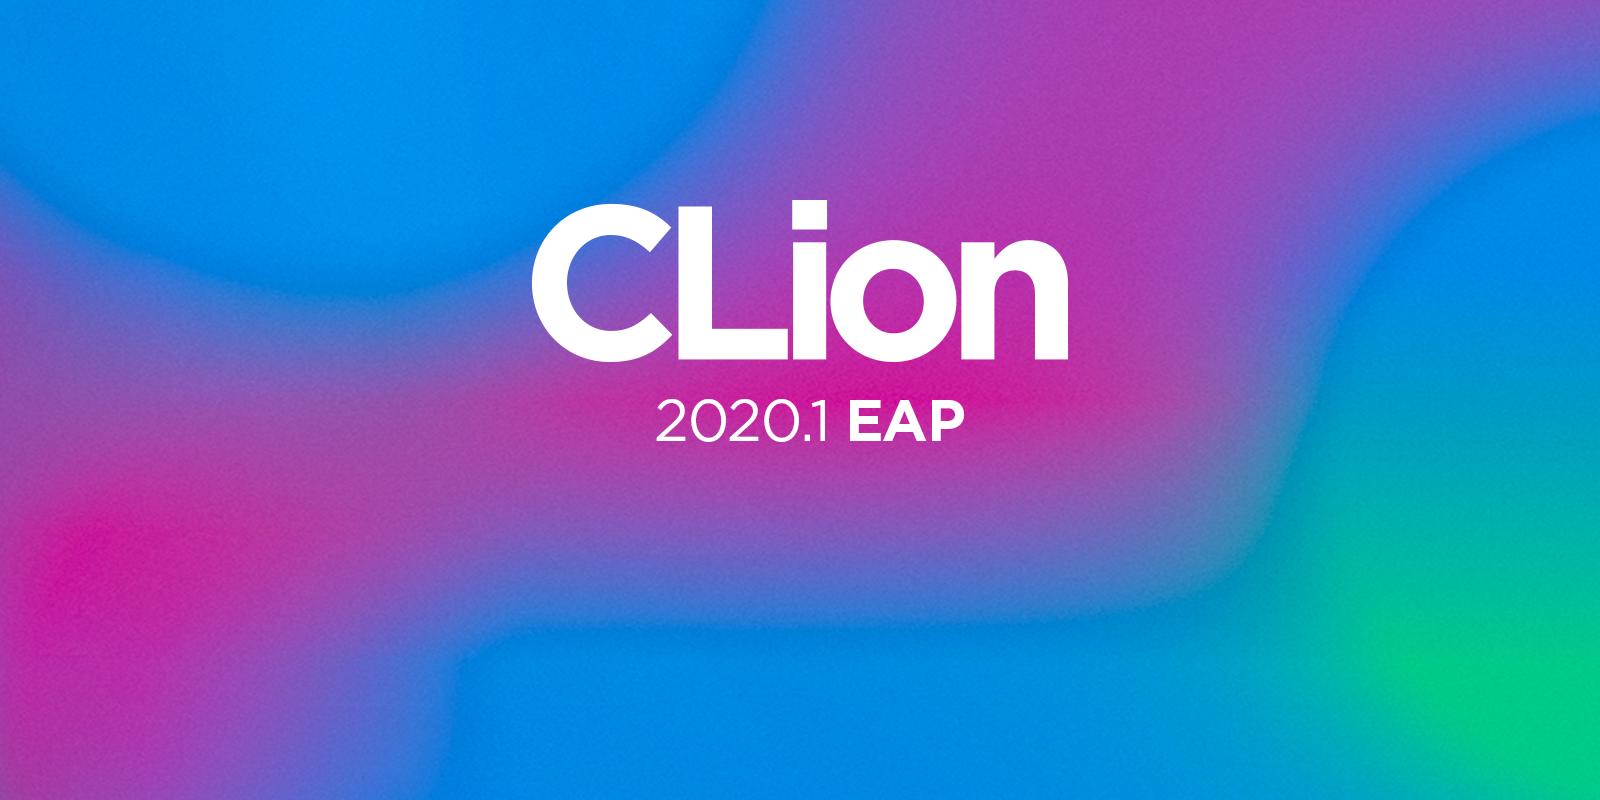 CLion EAP launched